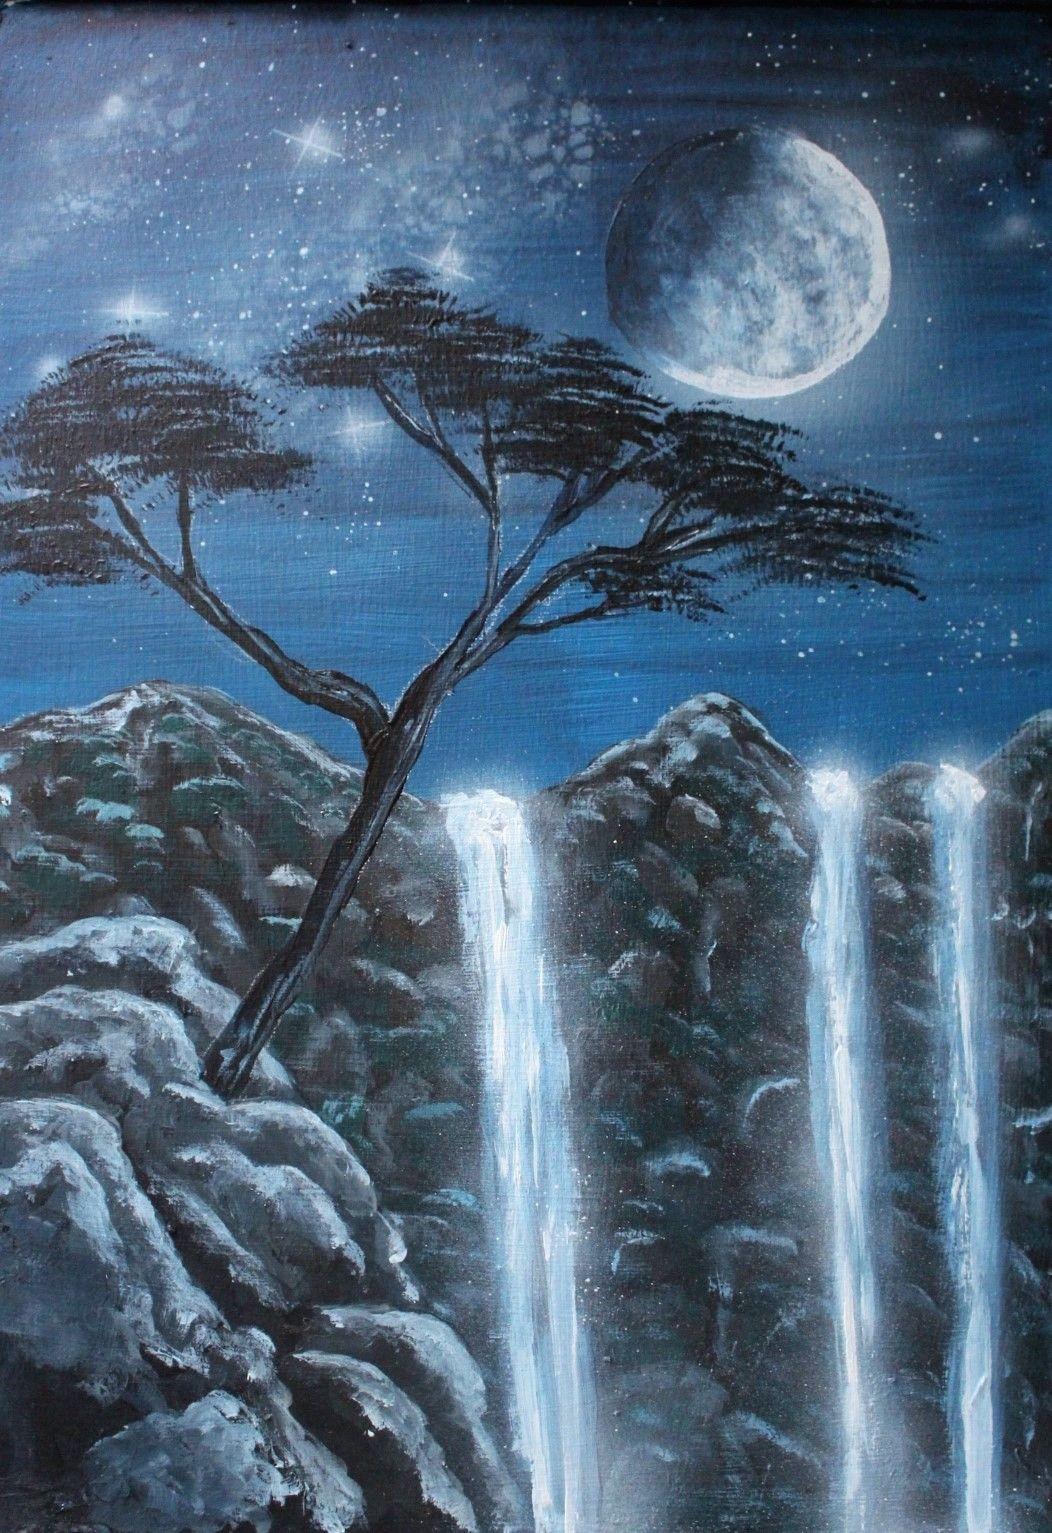 Waterfalls Moon Fullmoon Starrynight Night Sky Stars Tree Landscape Painting Art Waterfall Paintings Night Sky Painting Sky Painting